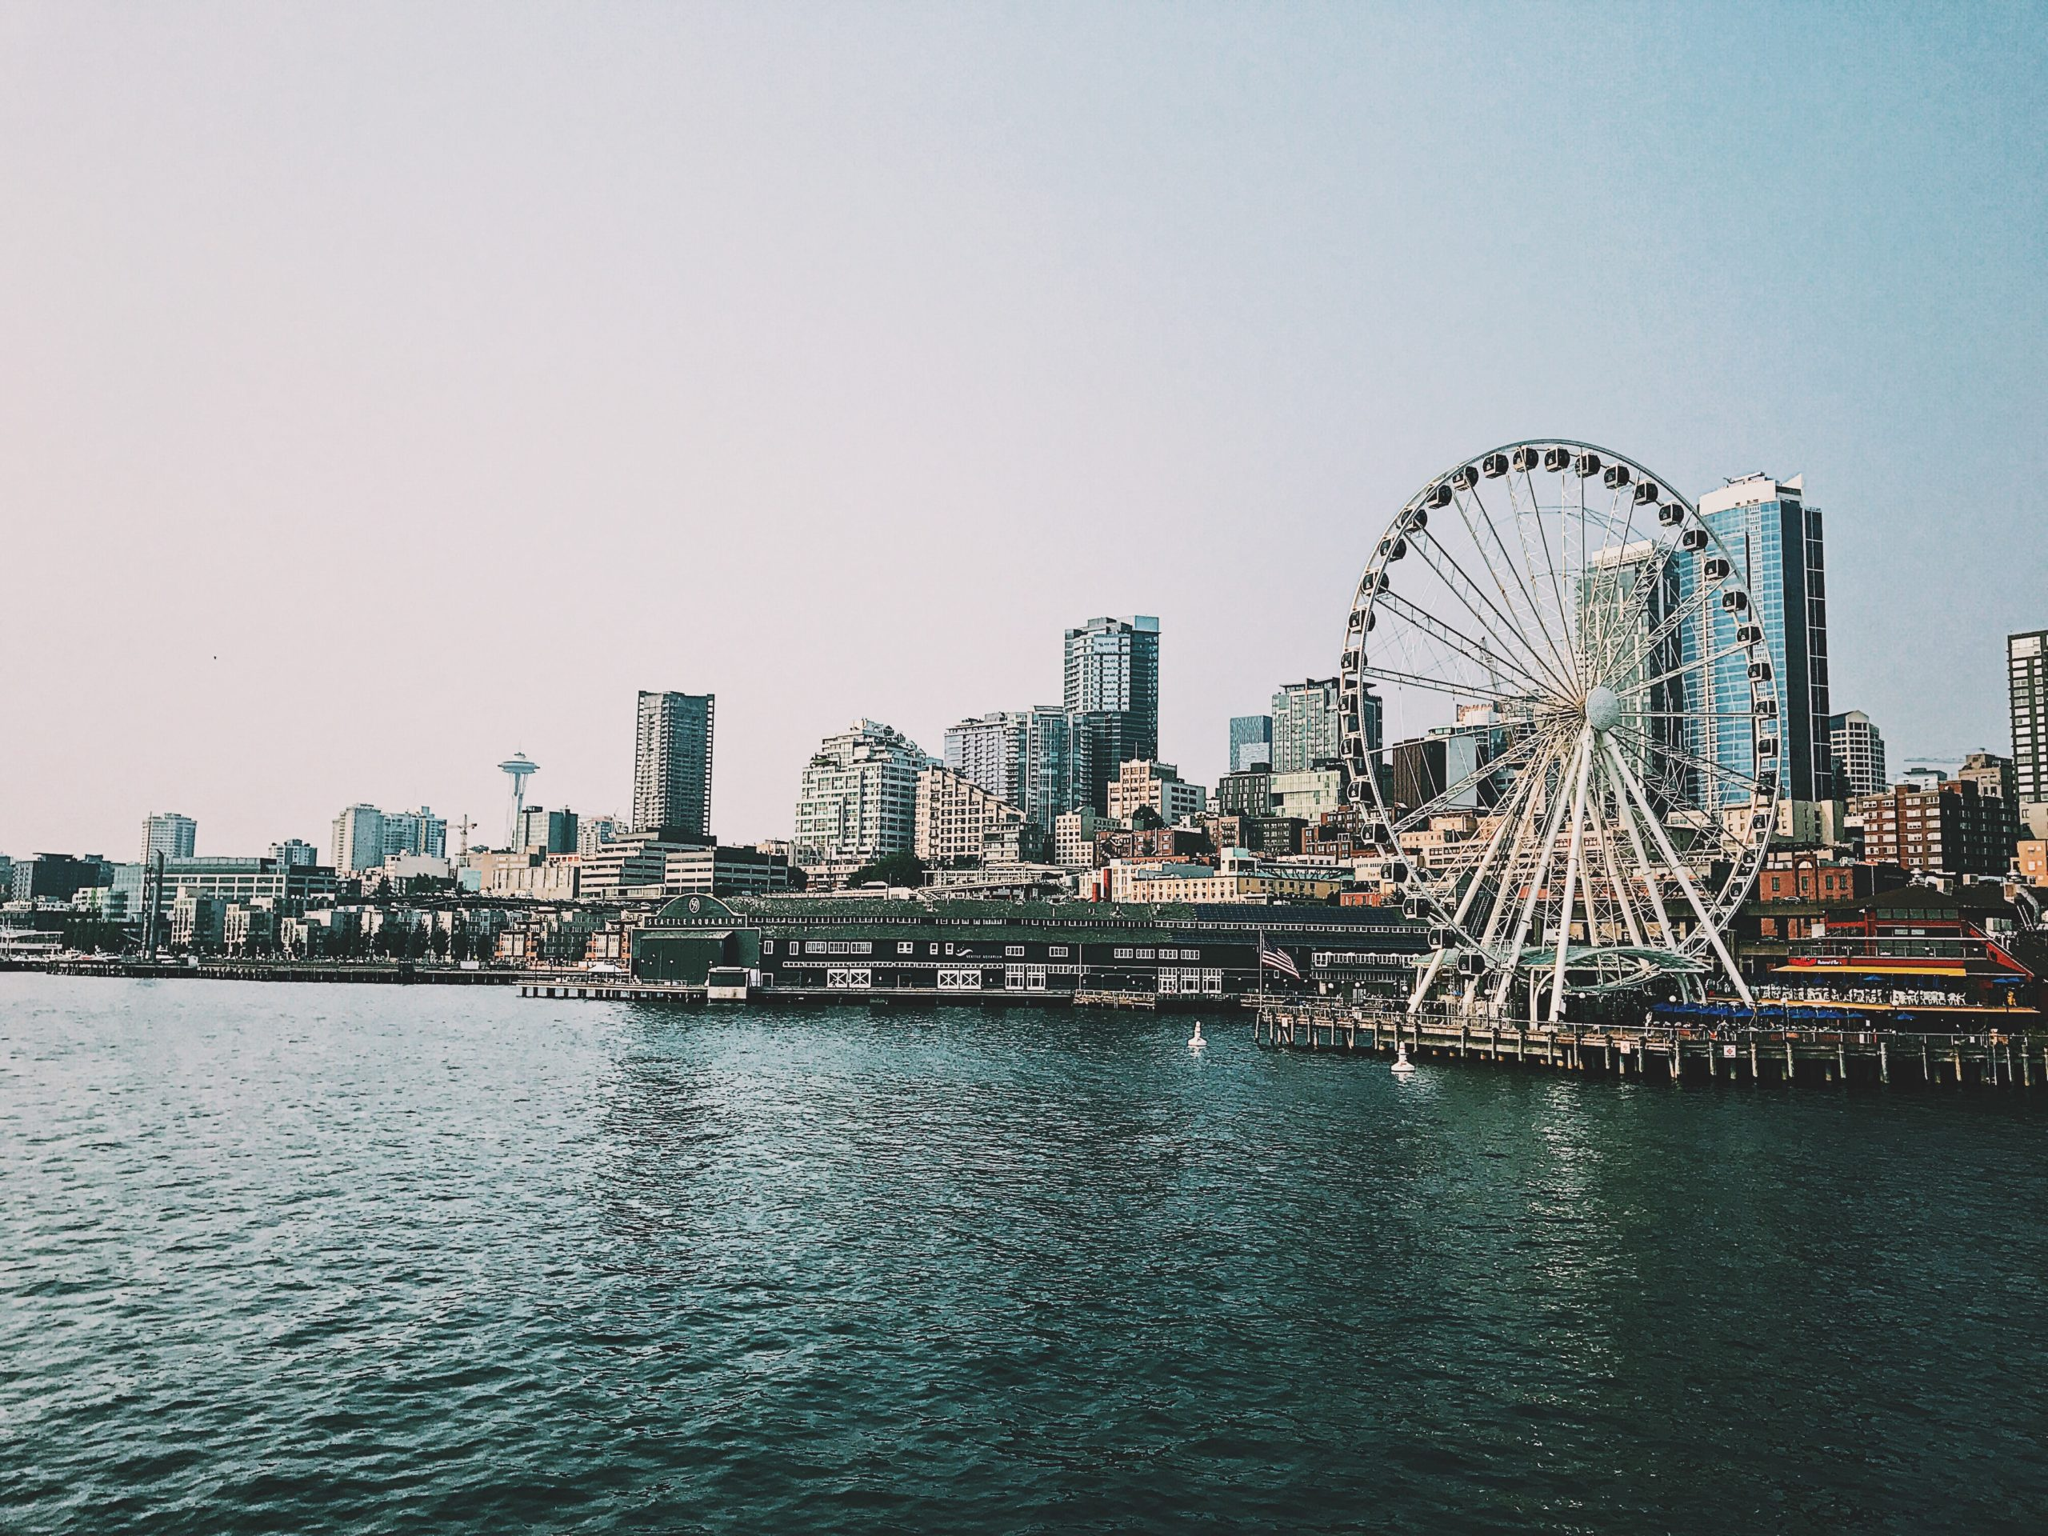 Seattle Photo by Felipe Galvan on Unsplash